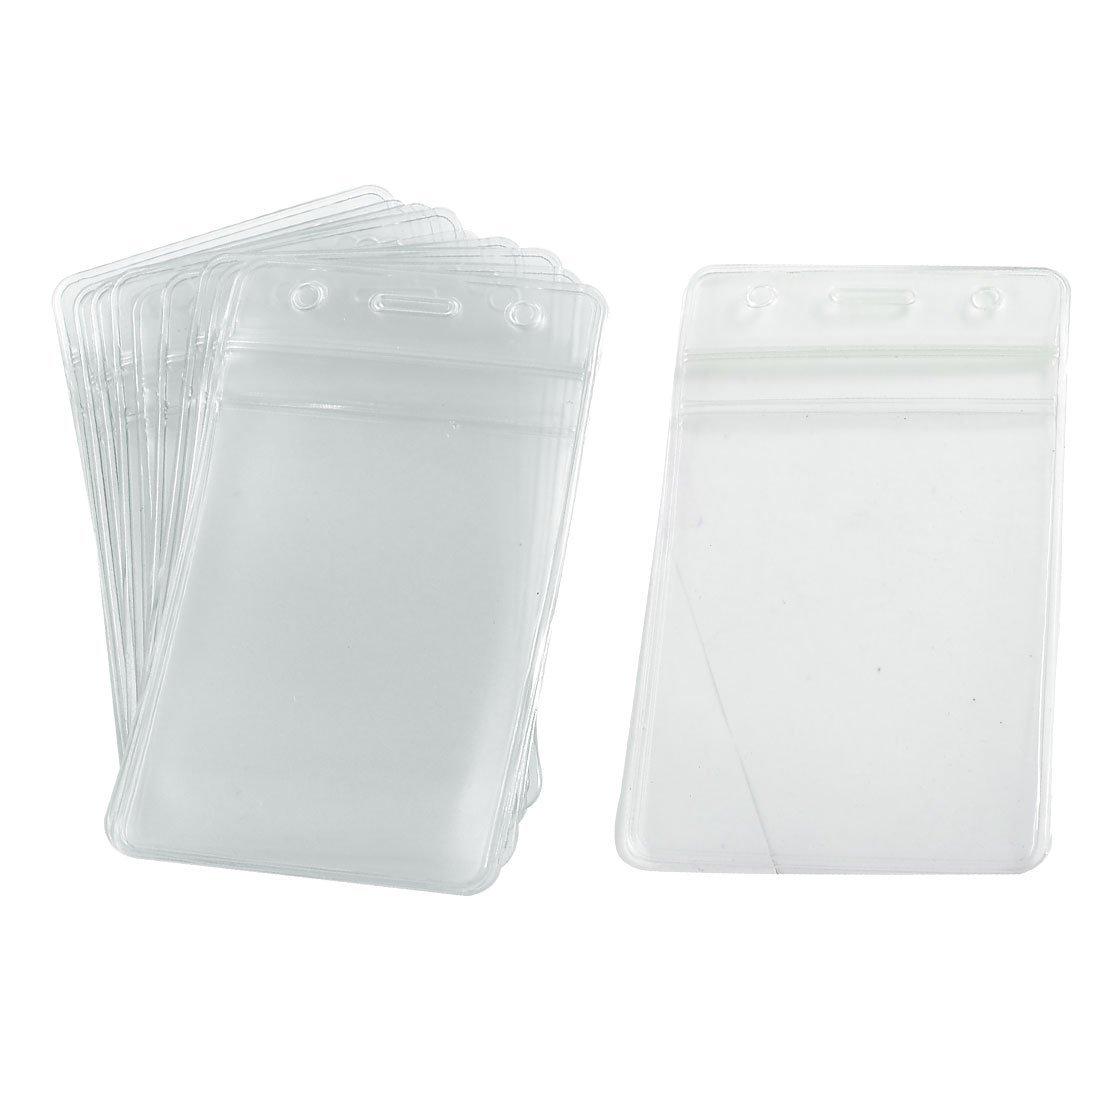 TOPWEL Ziplock Function 10pcs Waterproof Type Pvc Id Card Holder, Clear, Grünical Style Badge Id Card Holders by TOPWEL B0145G5EV4    | Charmantes Design